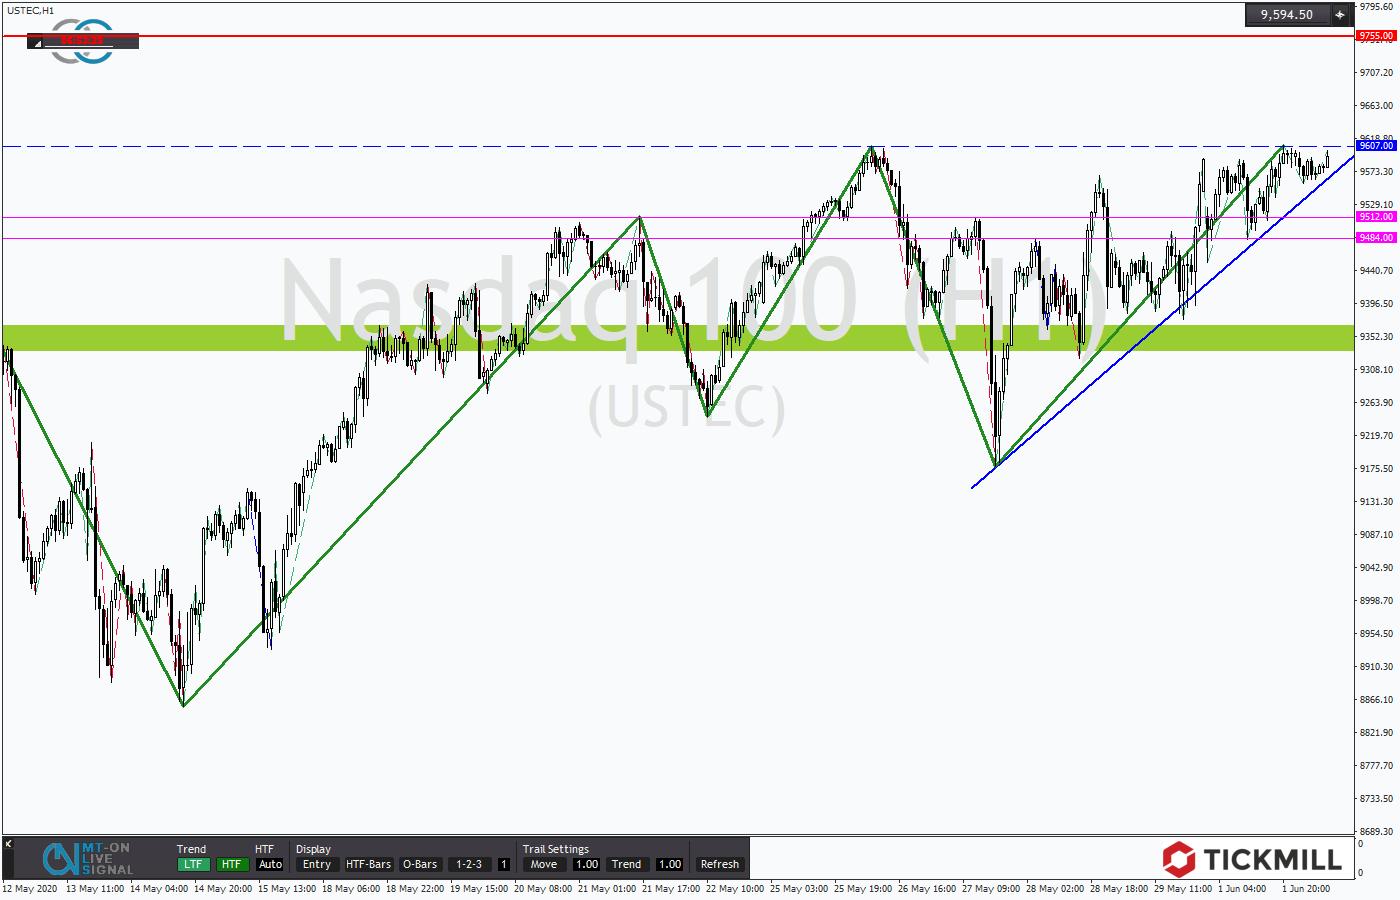 Tickmill-Analyse: Dreieck im NASDAQ